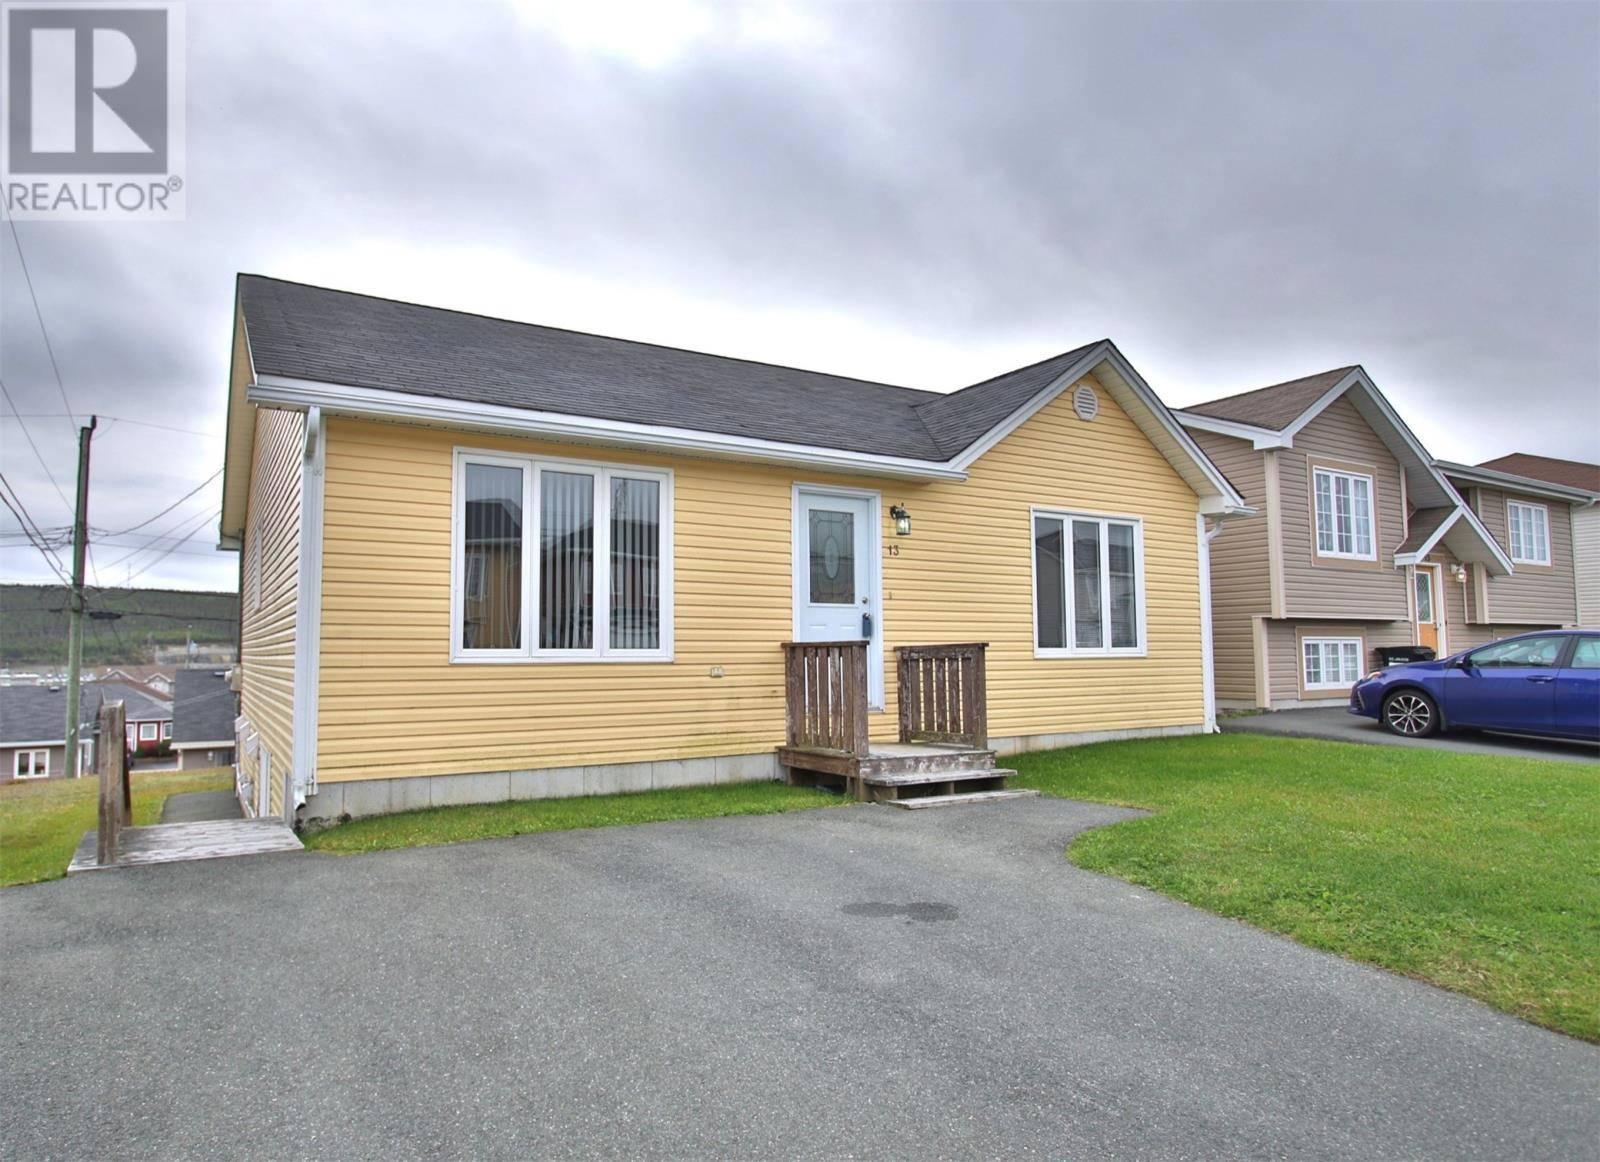 House for sale at 13 Hopedale Cres St. John's Newfoundland - MLS: 1205061